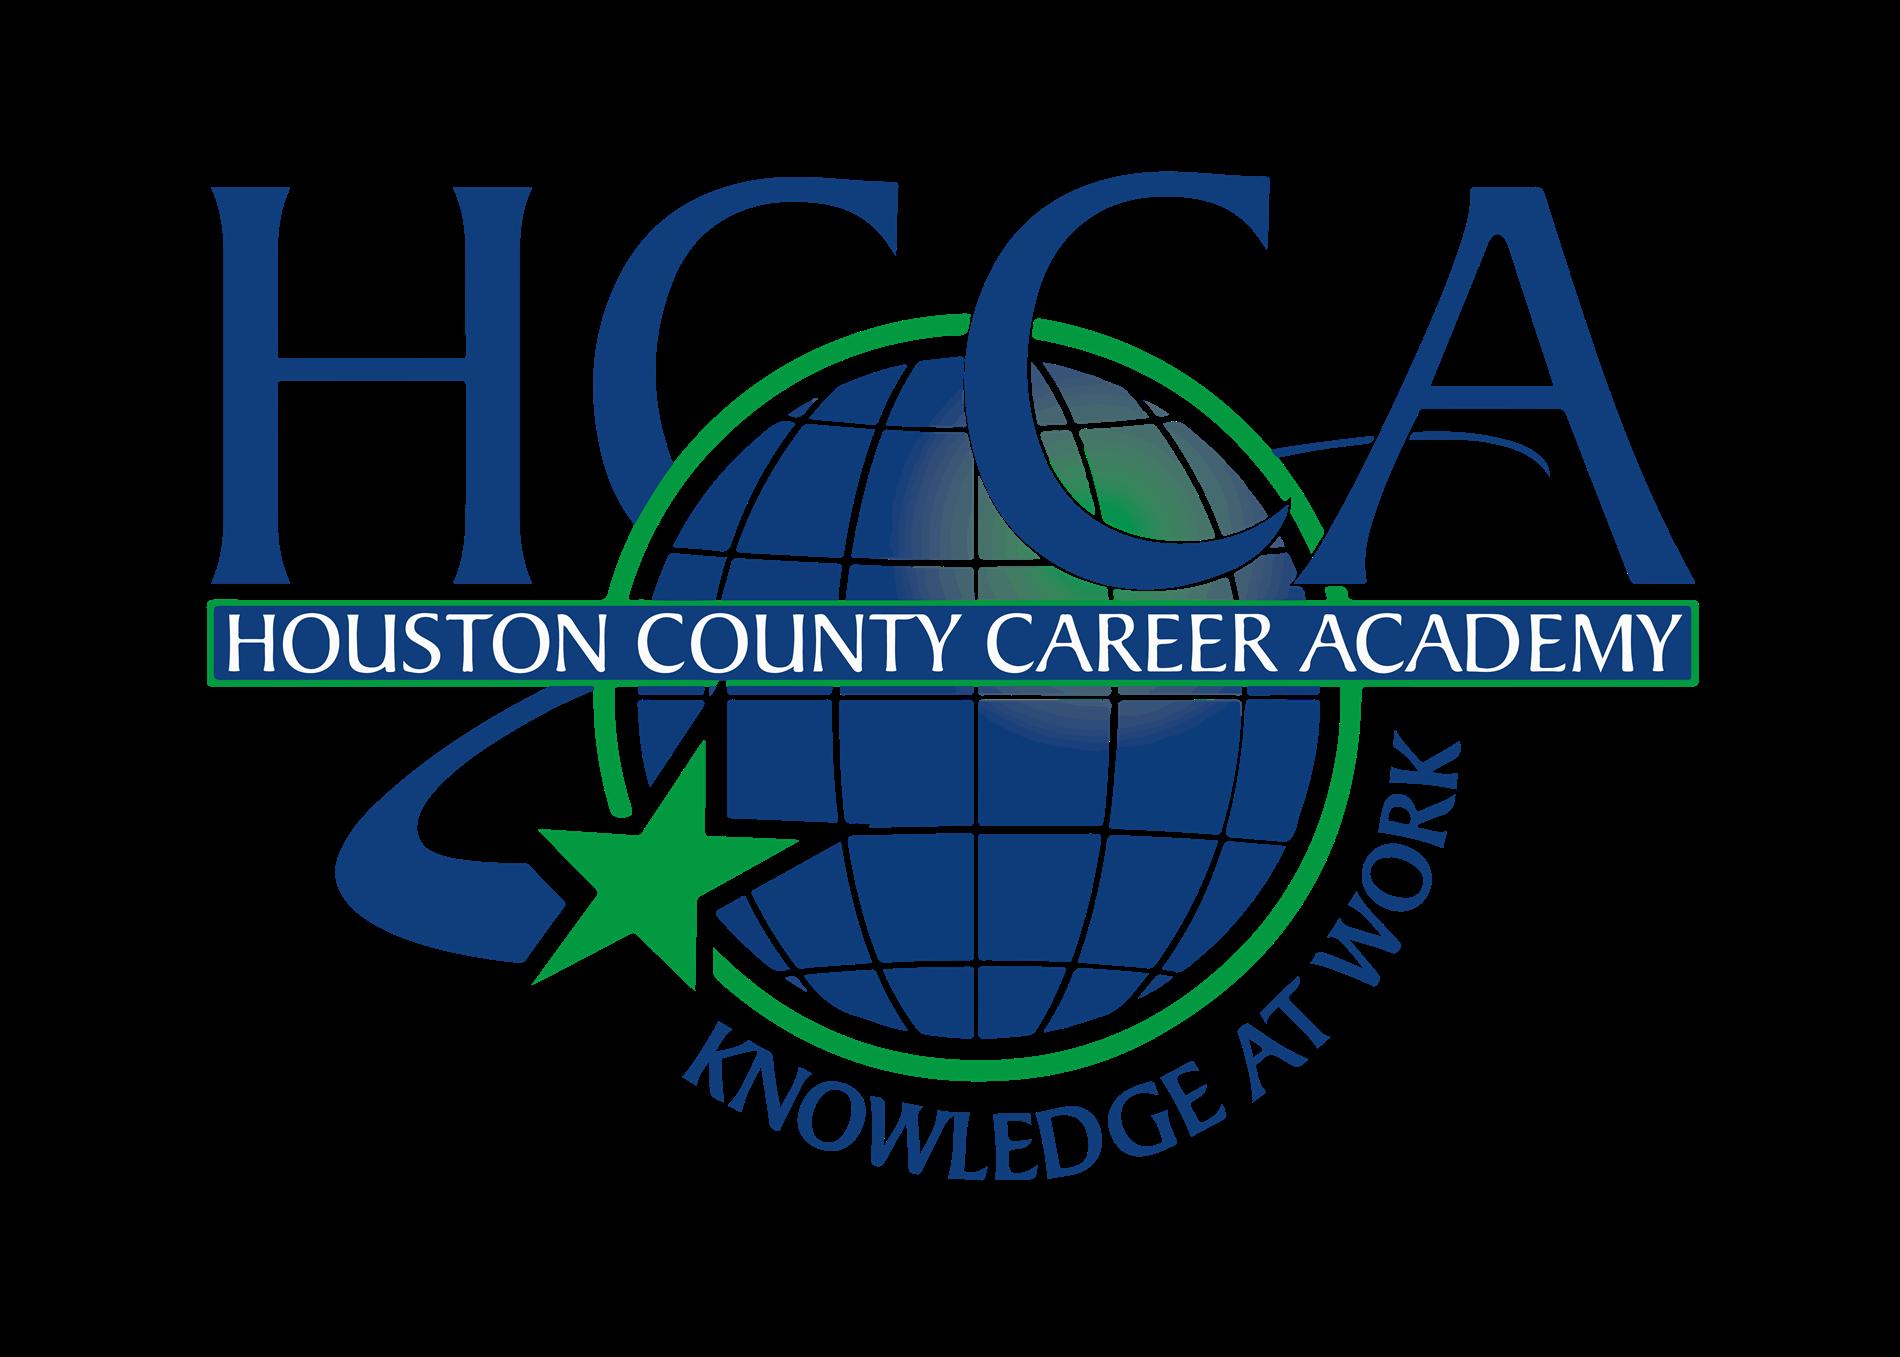 HCCA Interest Survey